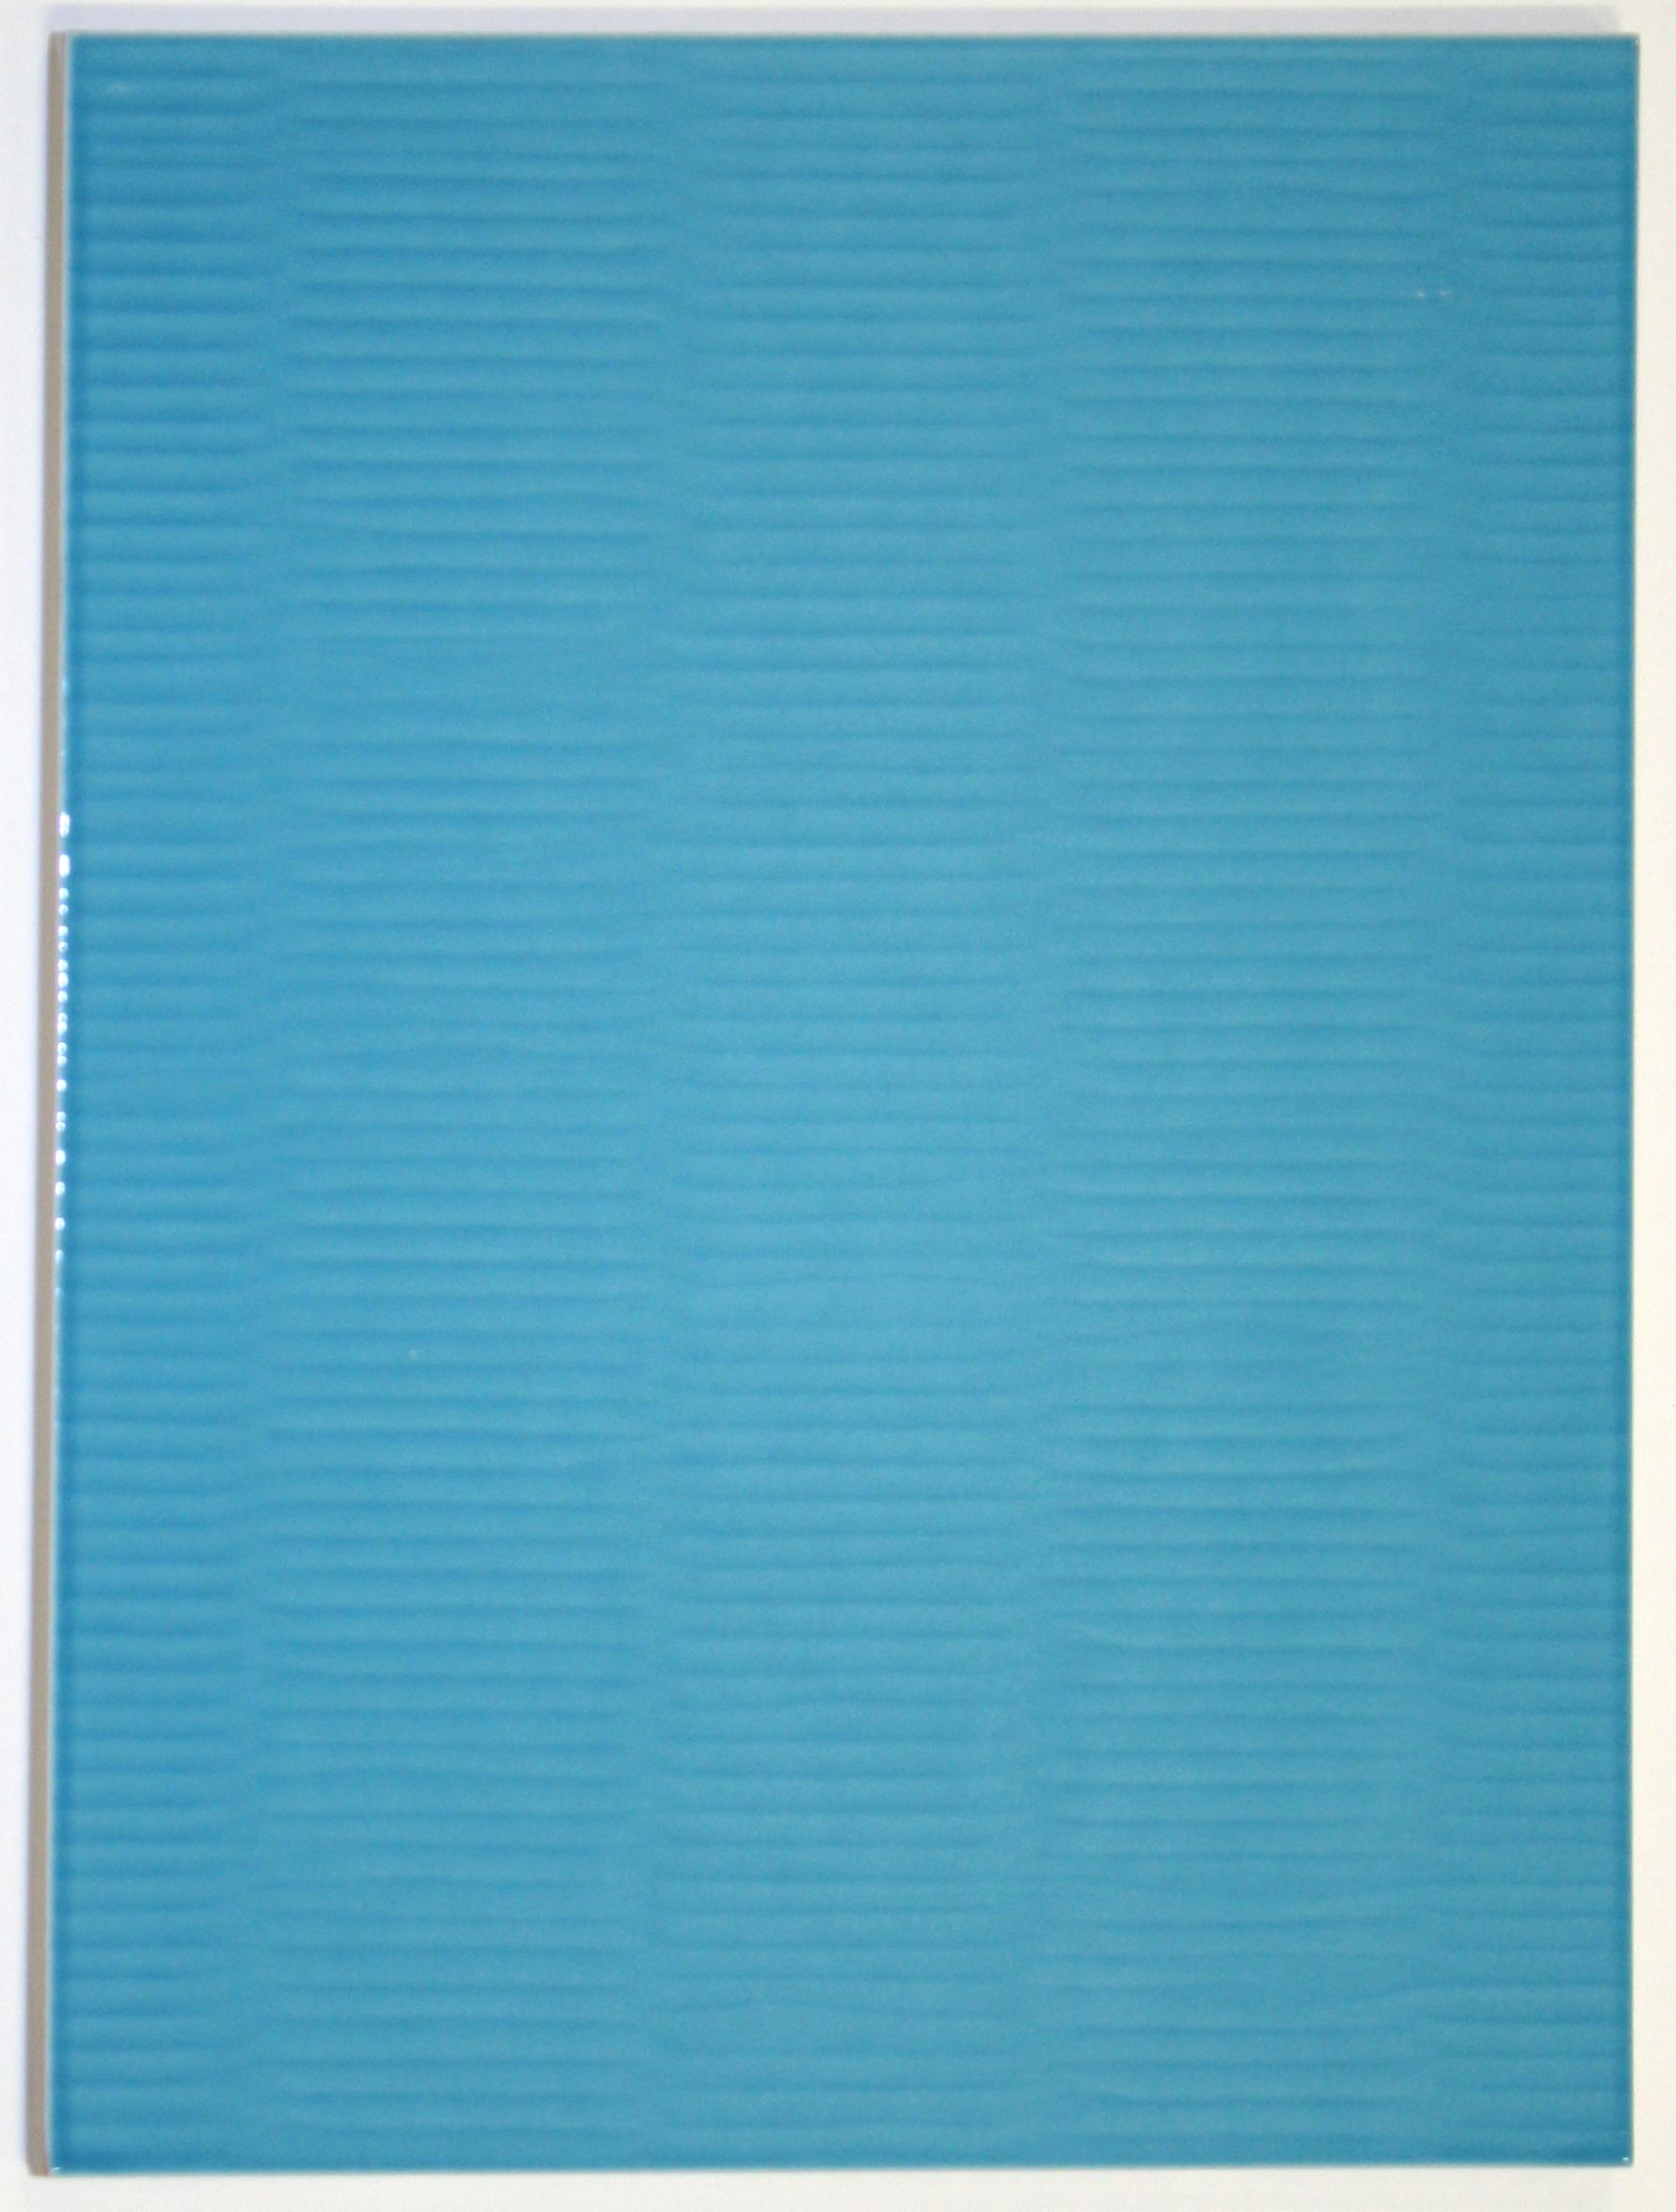 Плитка настенная 250х330х7 мм Гольфстрим бирюзовый (18 шт=1,49 кв.м)